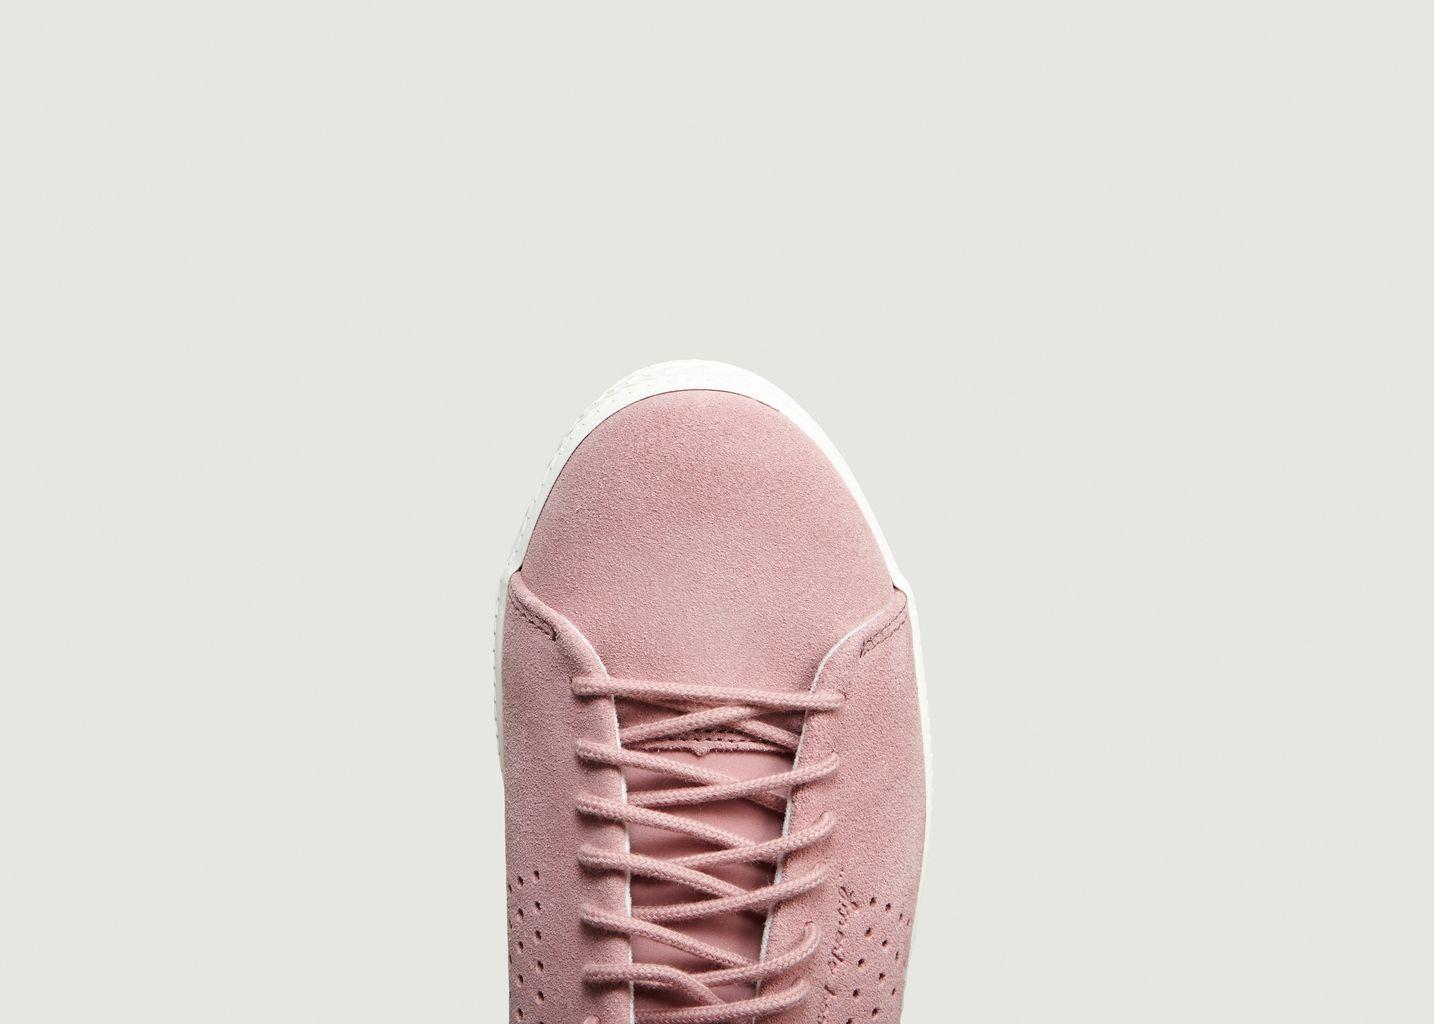 dc8537b45059 Charline Suede Trainers Pink Le Coq Sportif | L'Exception